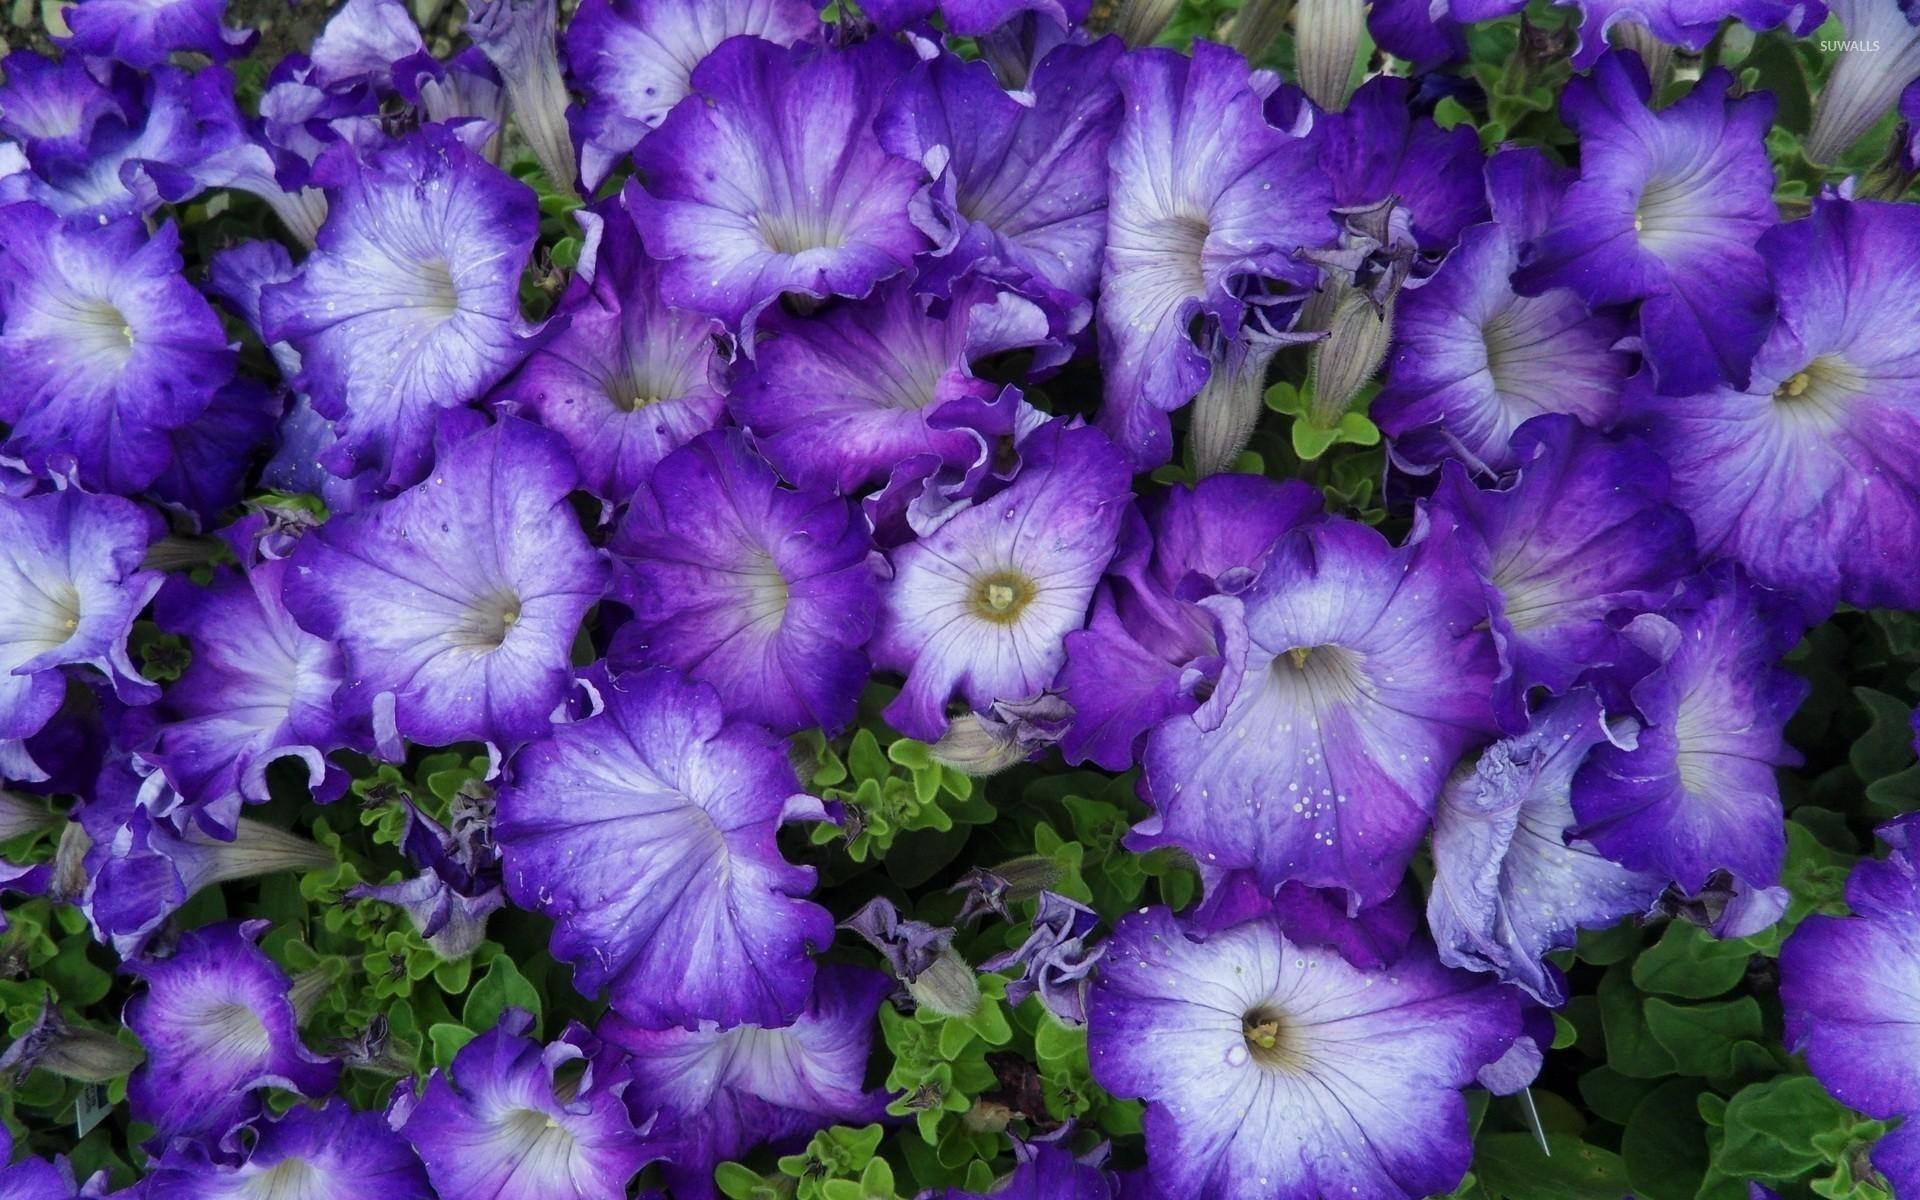 Purple Petunias [3] wallpaper - Flower wallpapers - #40205